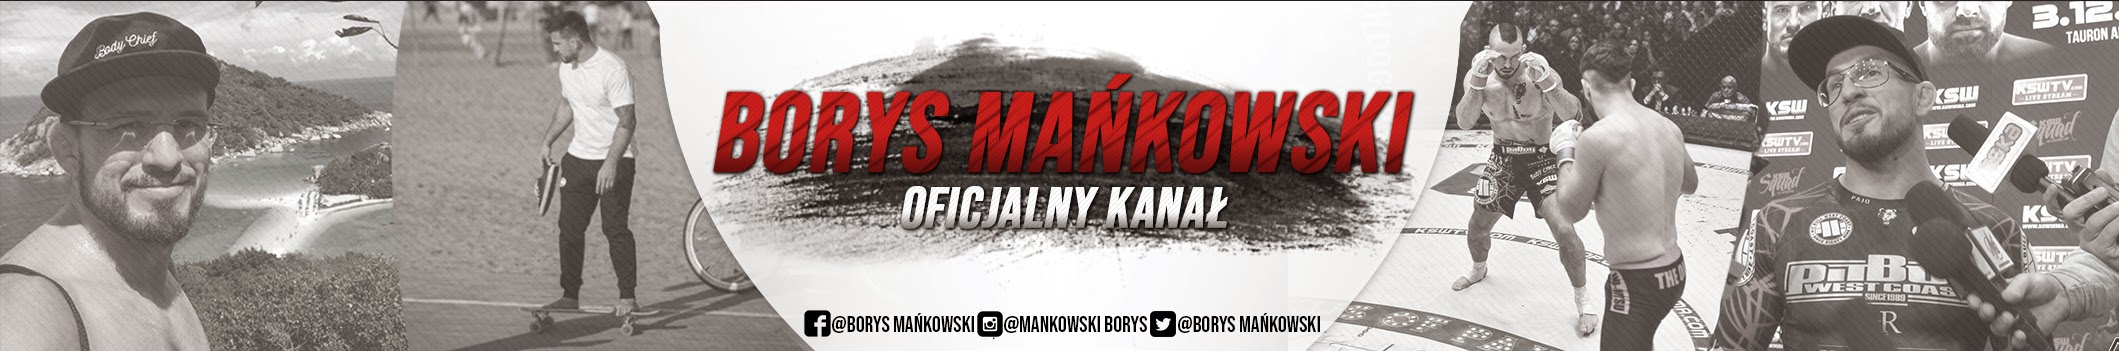 Borys Mankowski TV